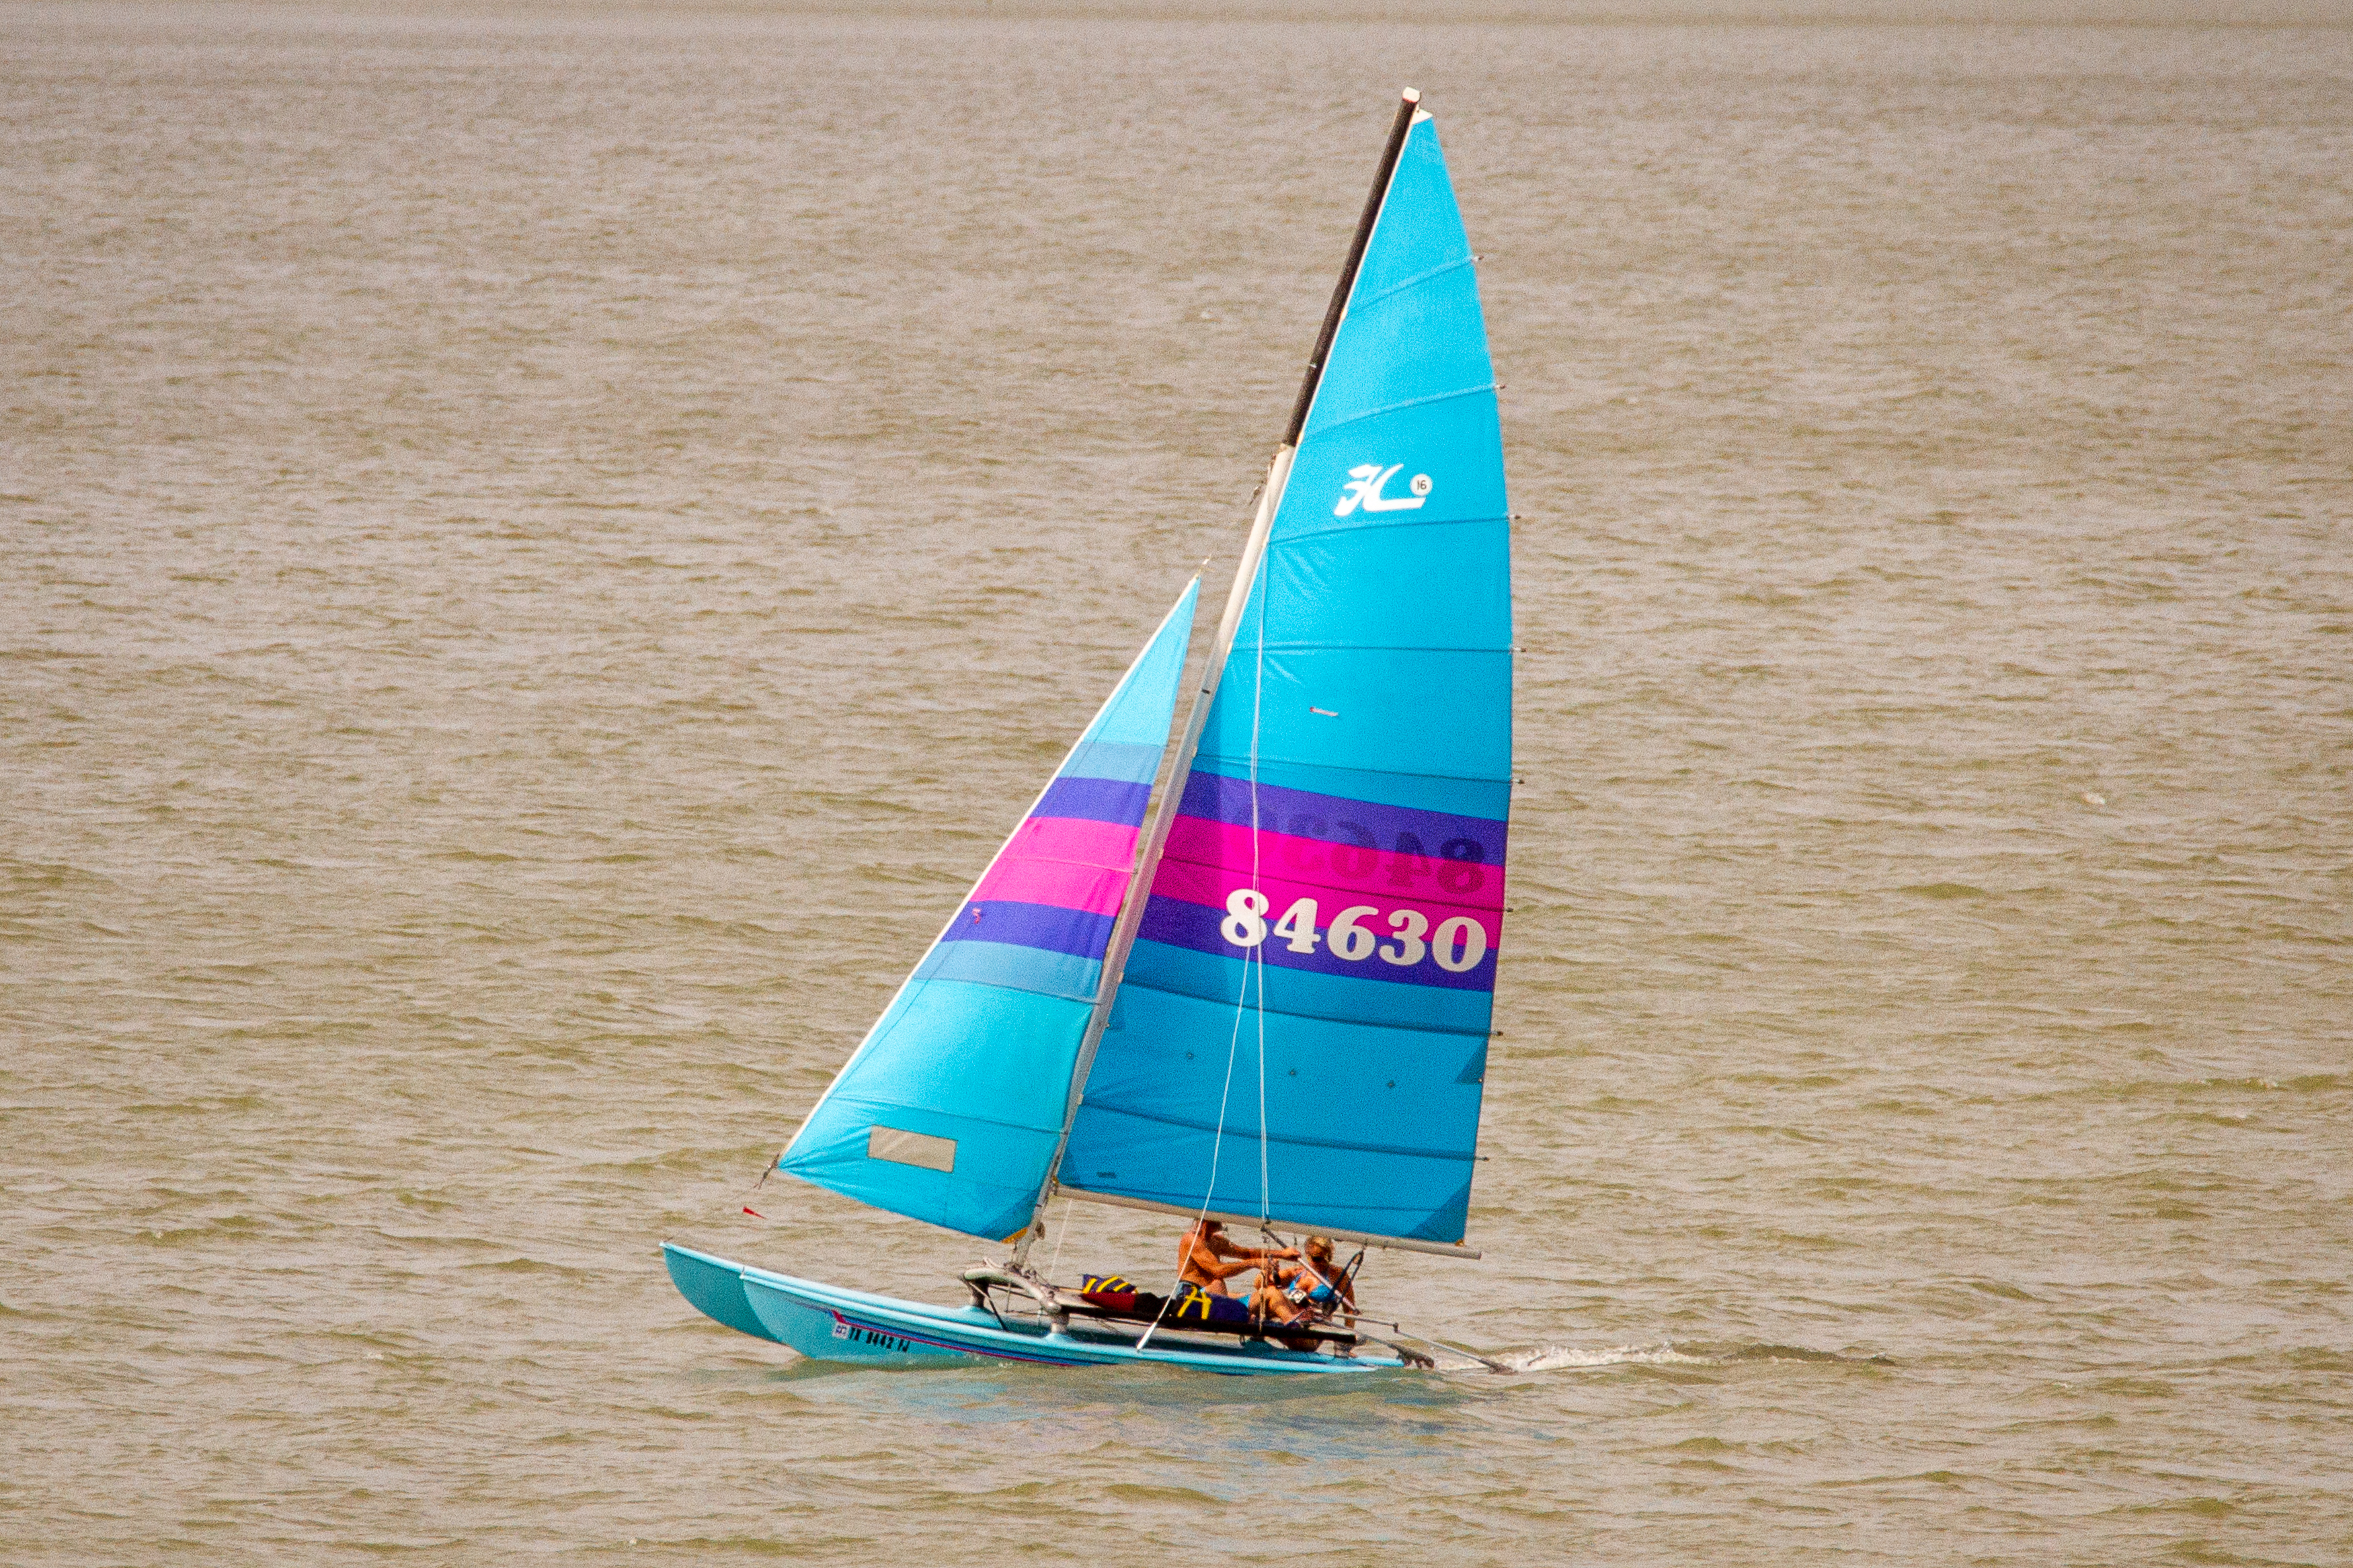 A hobie cat sails along Lake Corpus Christi.